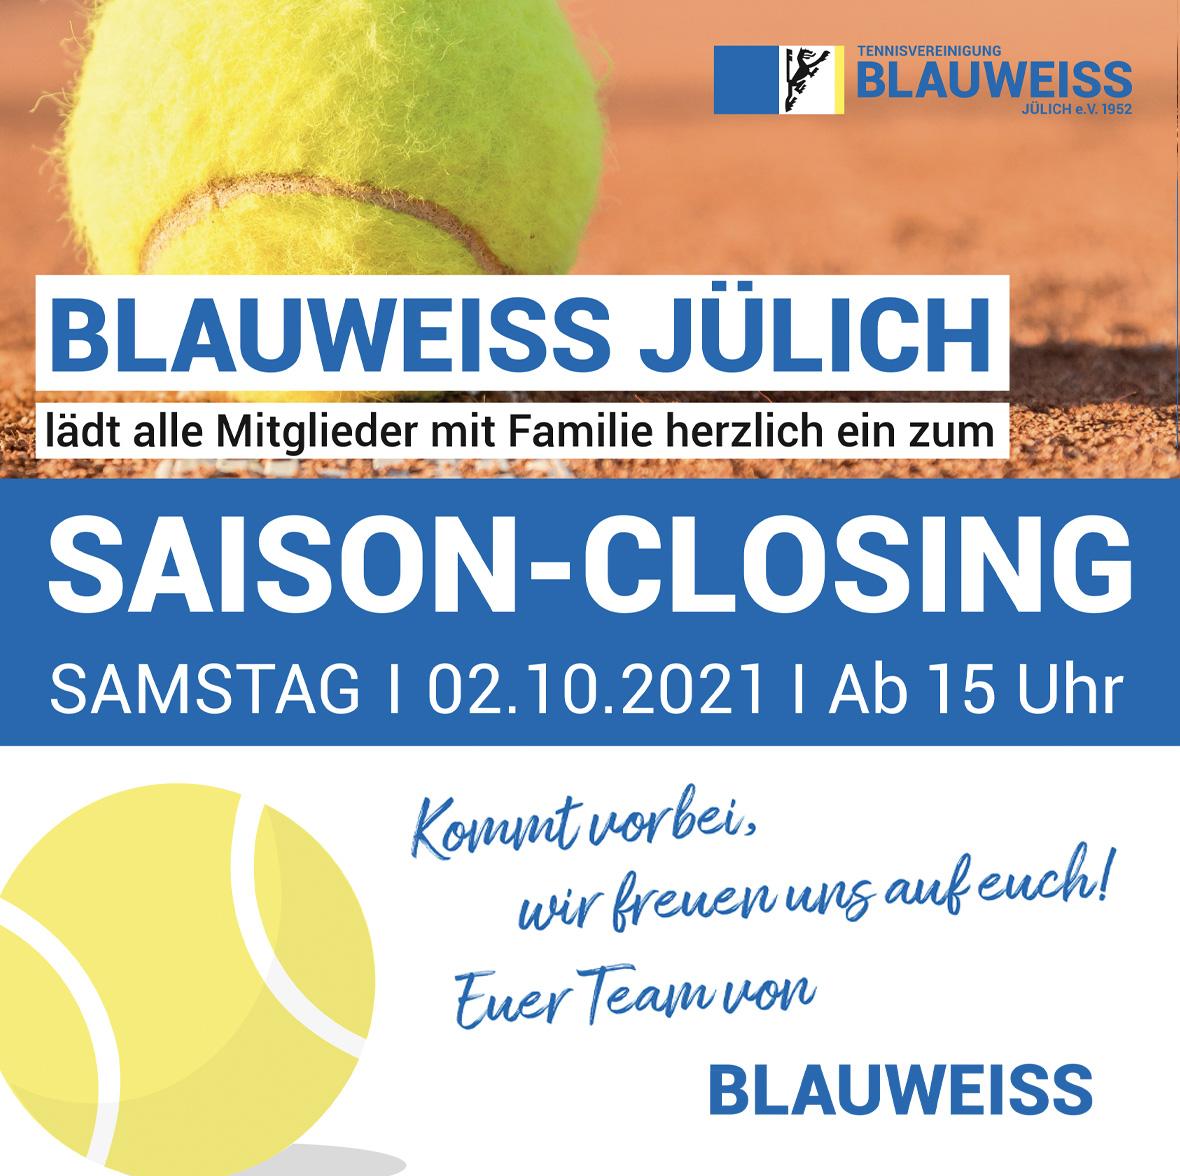 Saison-Closing am 02.10.2021